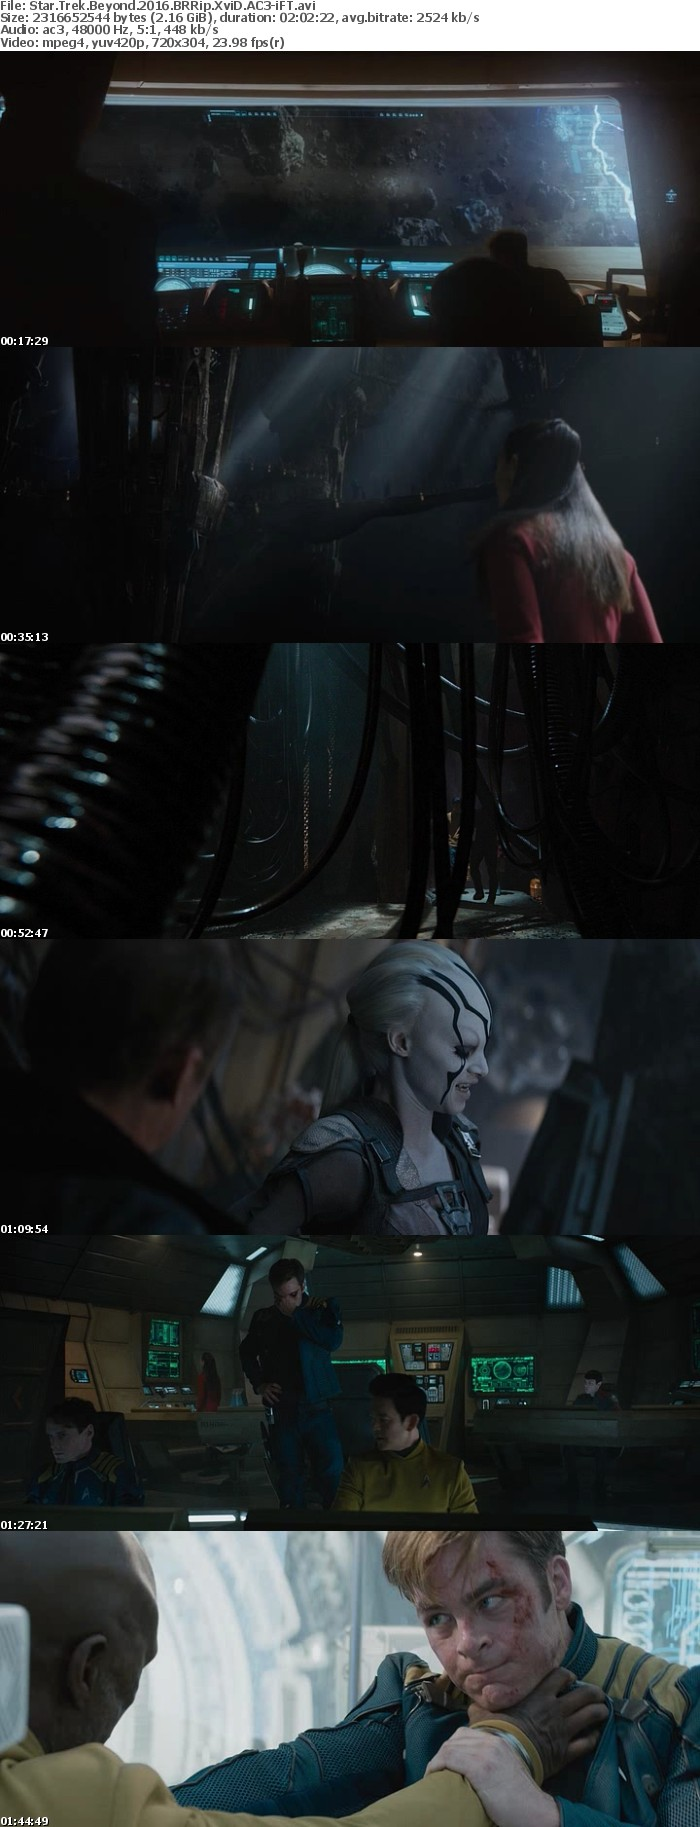 Star Trek Beyond 2016 BRRip XviD AC3-iFT